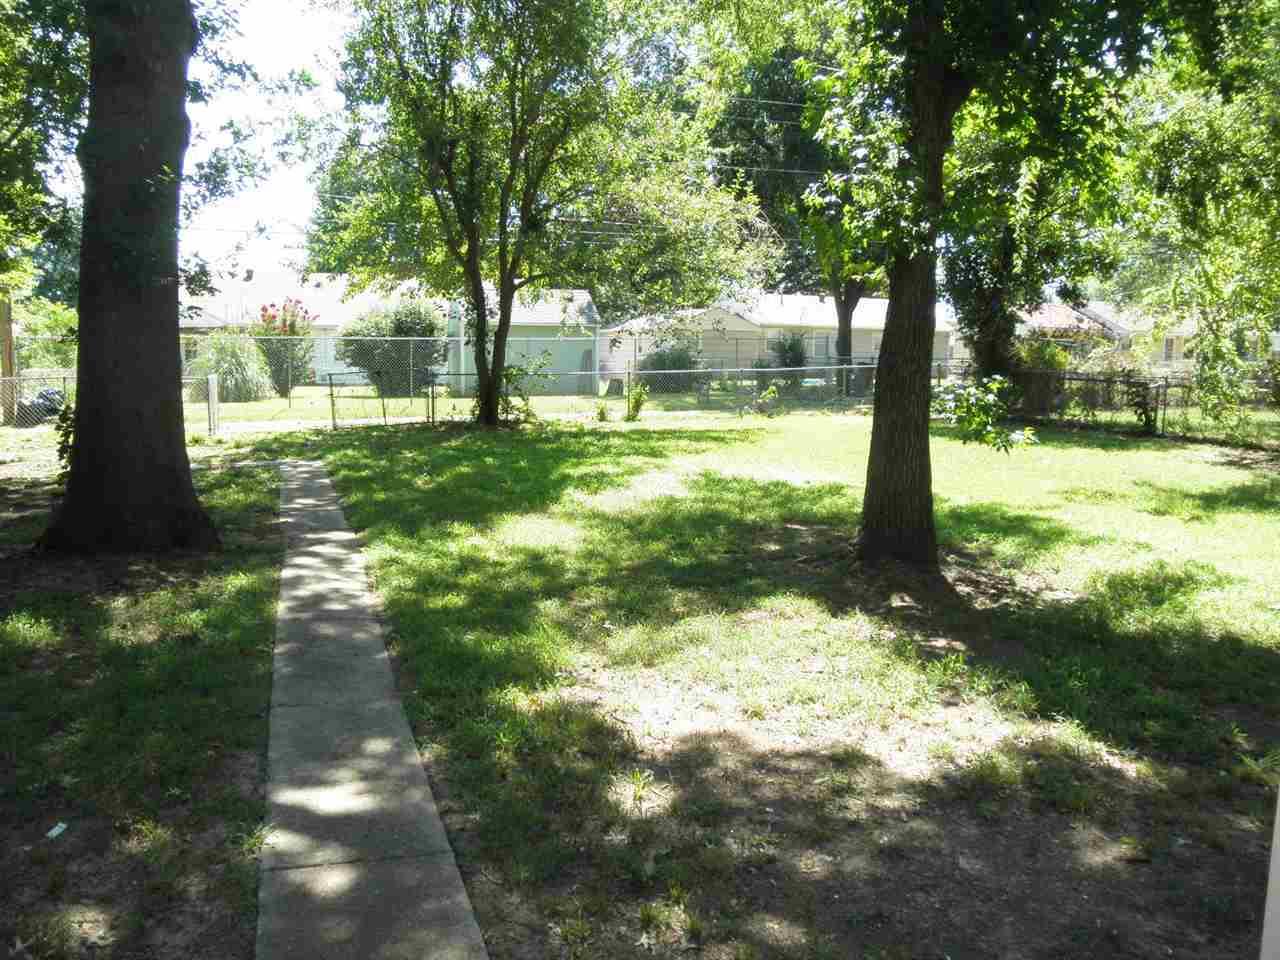 #century21groupone, #homesforsaleponcacity, #poncacityrealestate | 401 N 12th Ponca City, OK 74601 16